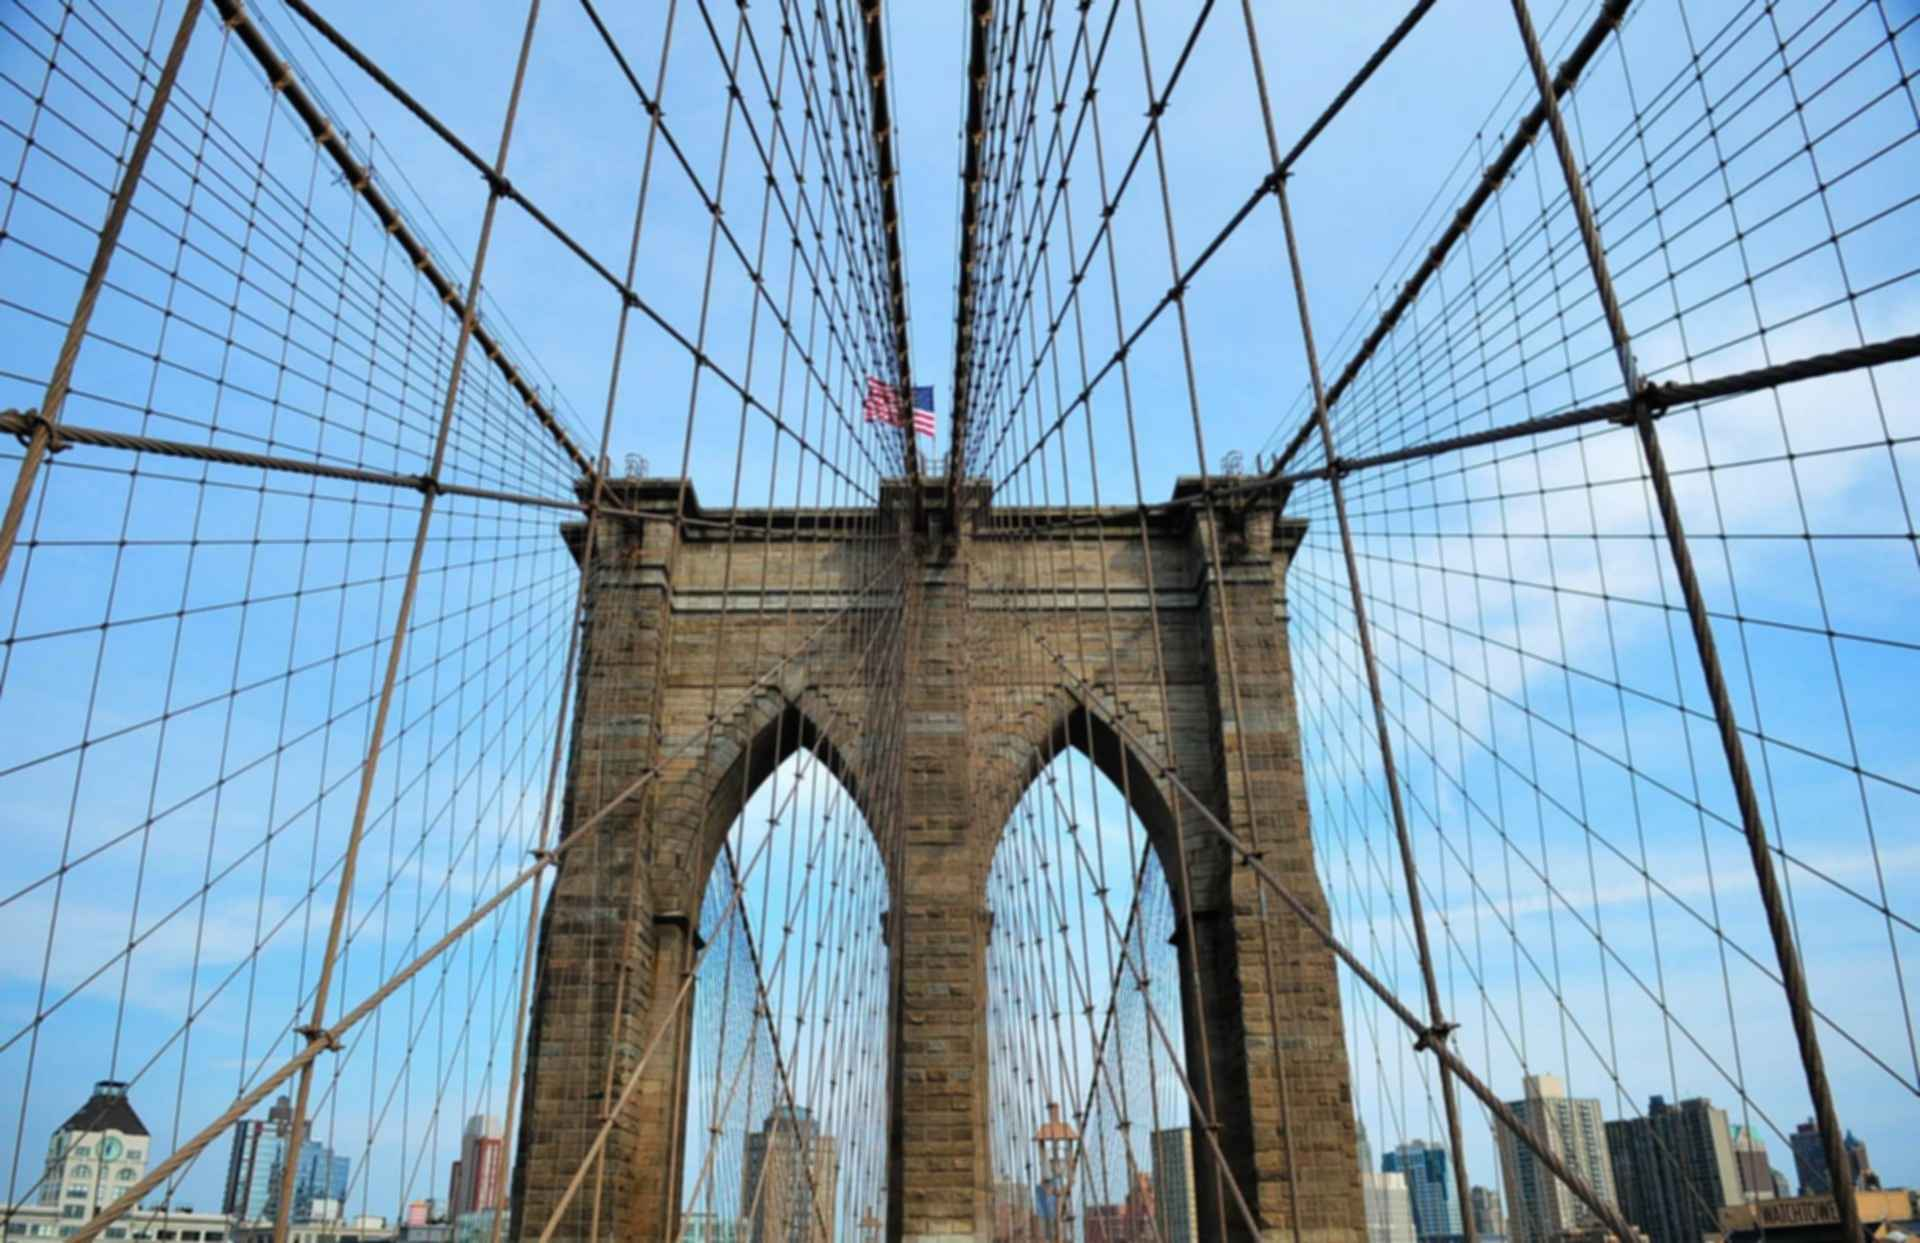 Brooklyn Bridge - Support Wires